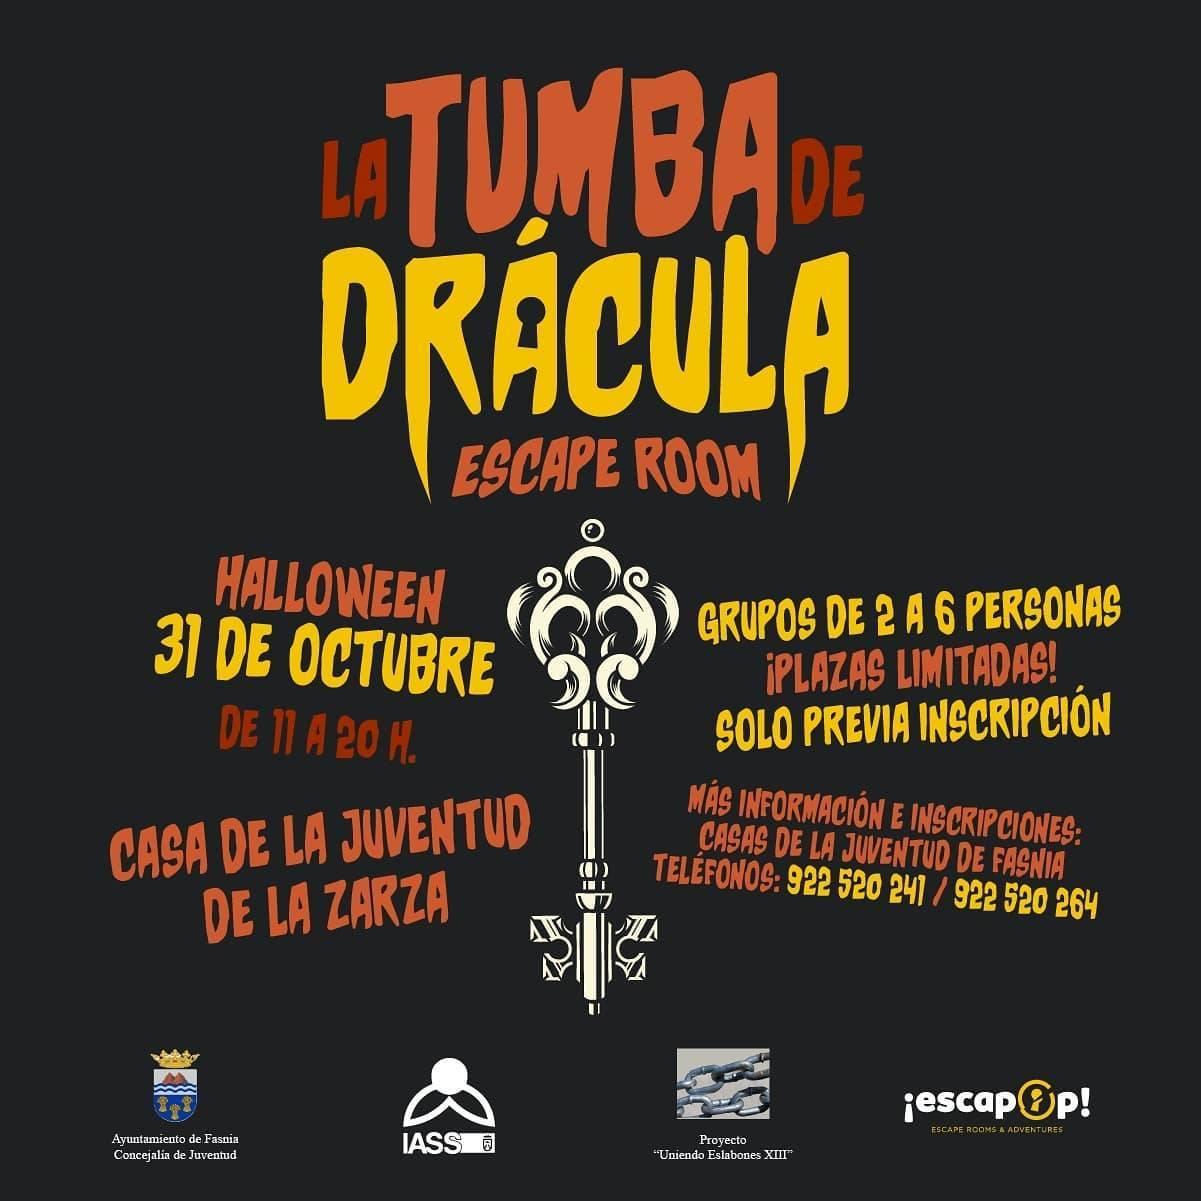 La tumba de Drácula (2020) - Fasnia (Santa Cruz de Tenerife)